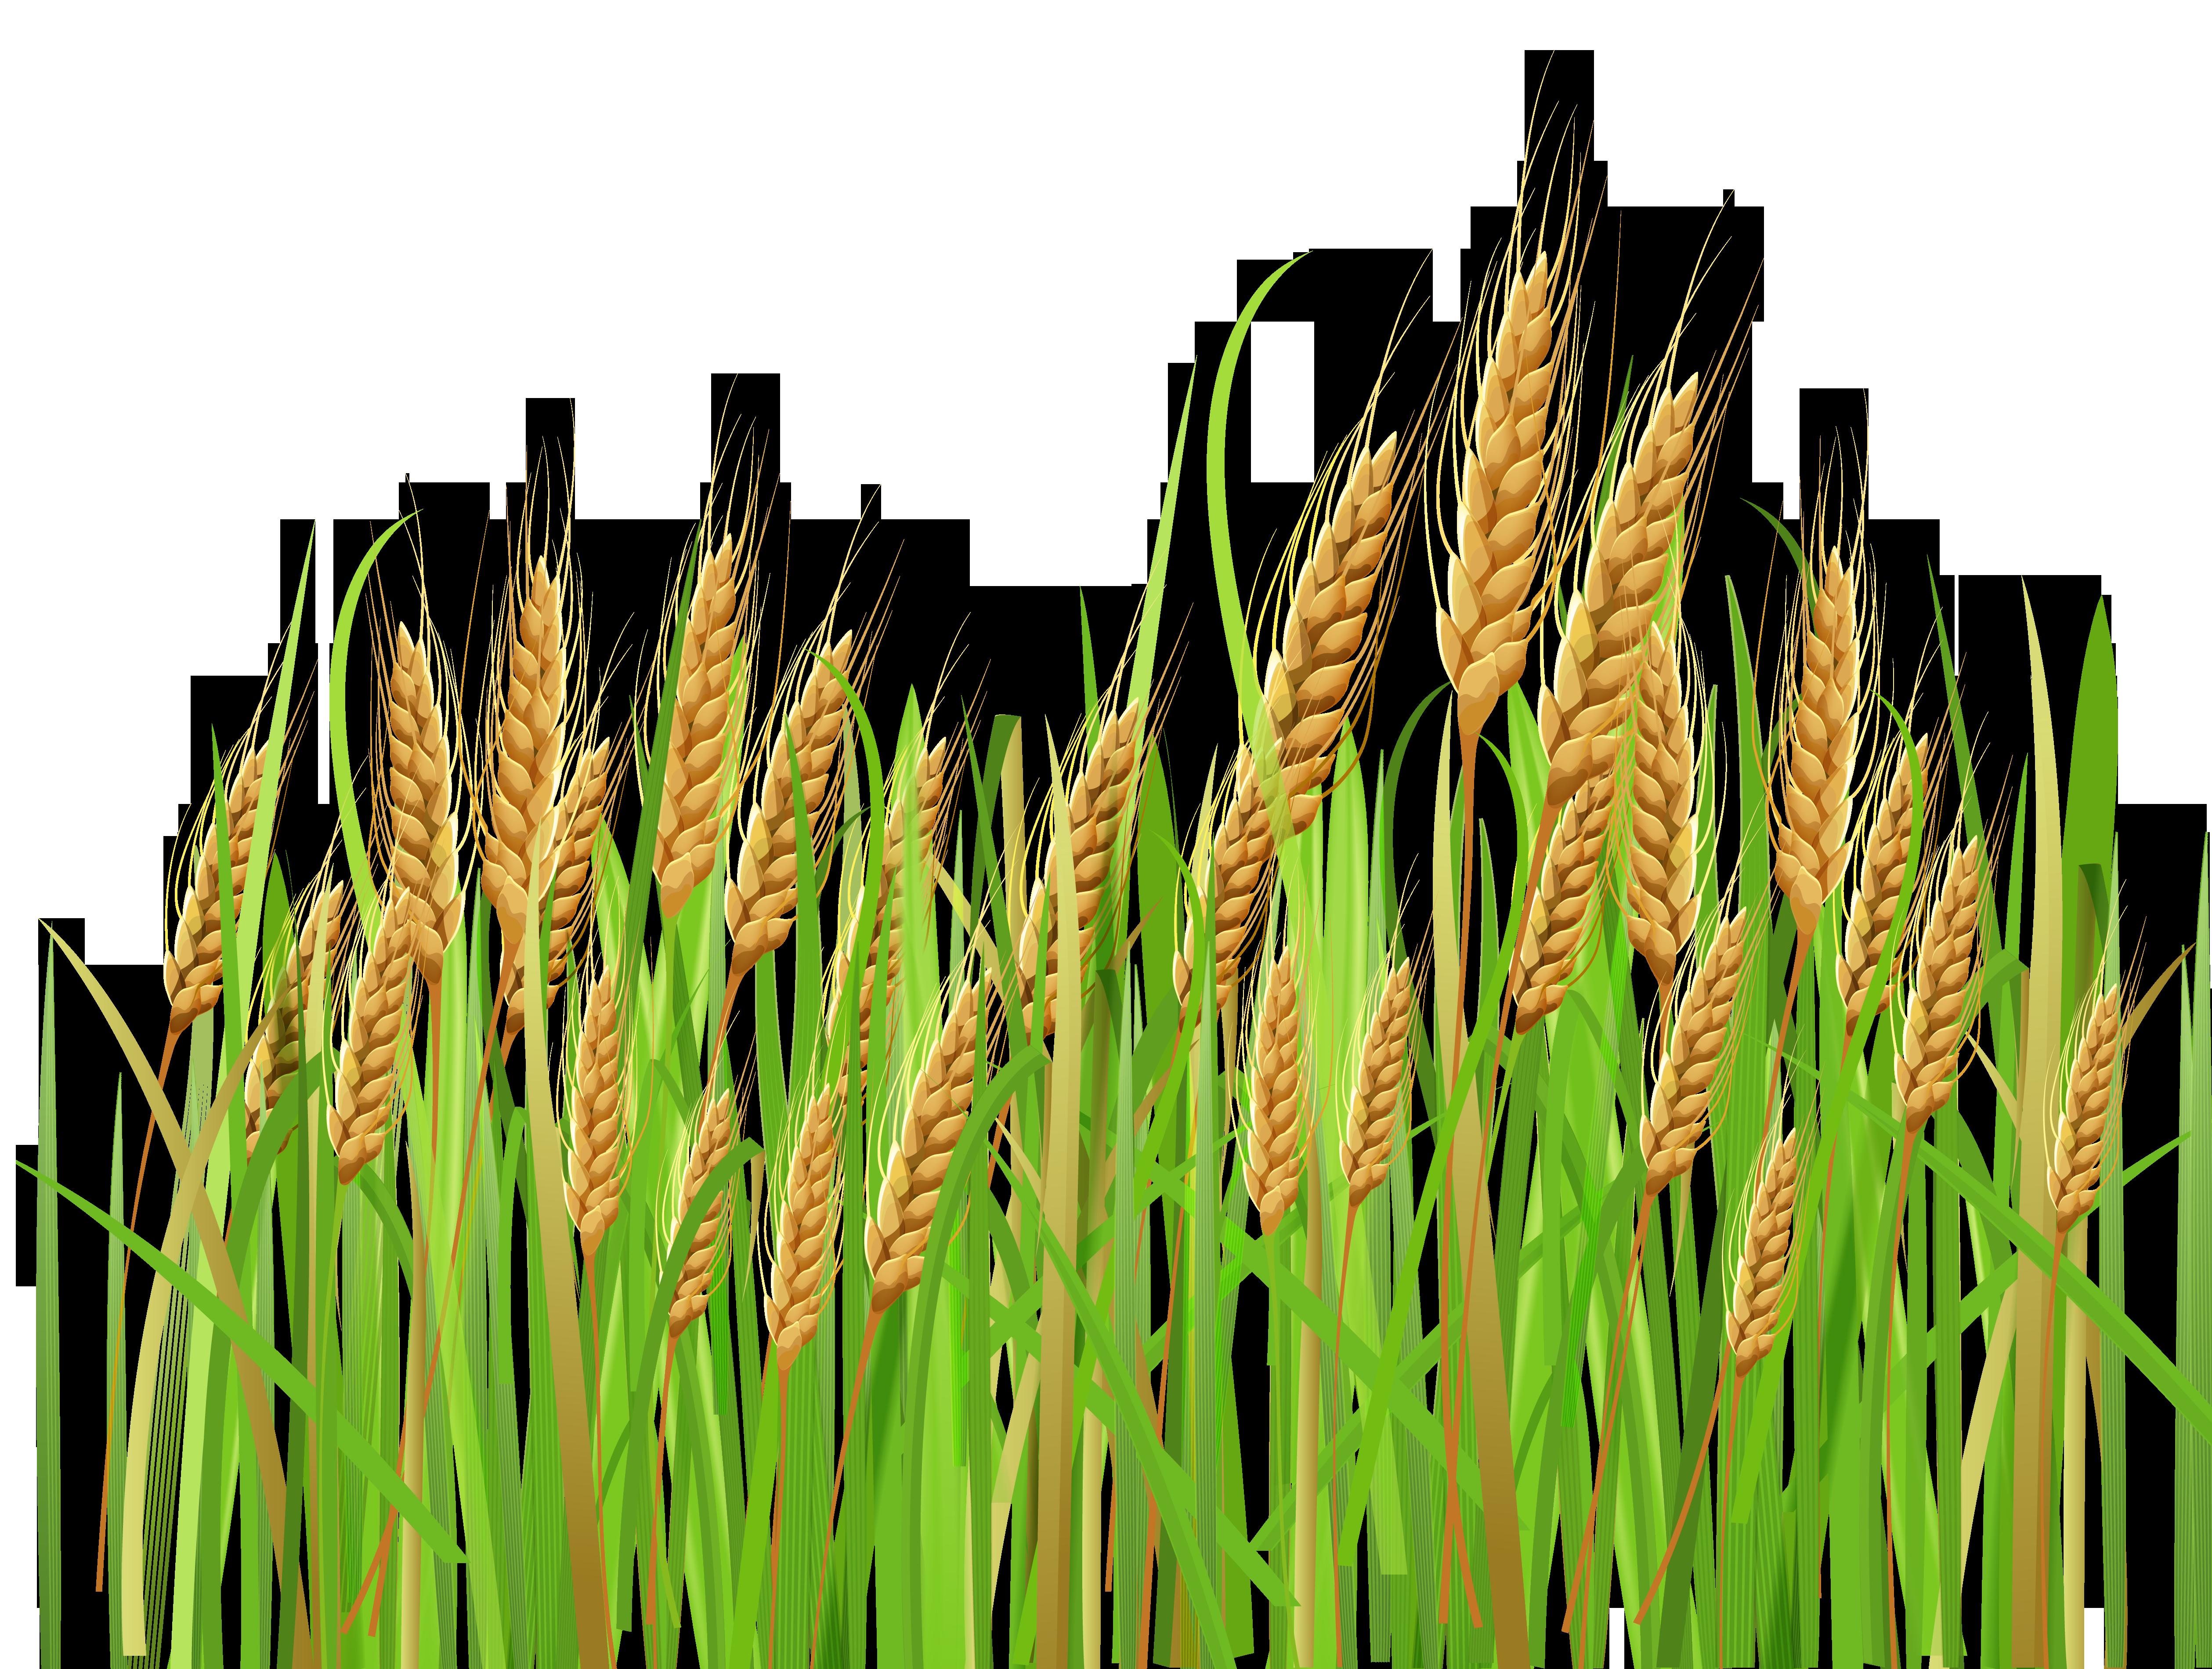 Star field clipart vector stock Clipart Wheat & Wheat Clip Art Images - ClipartALL.com vector stock